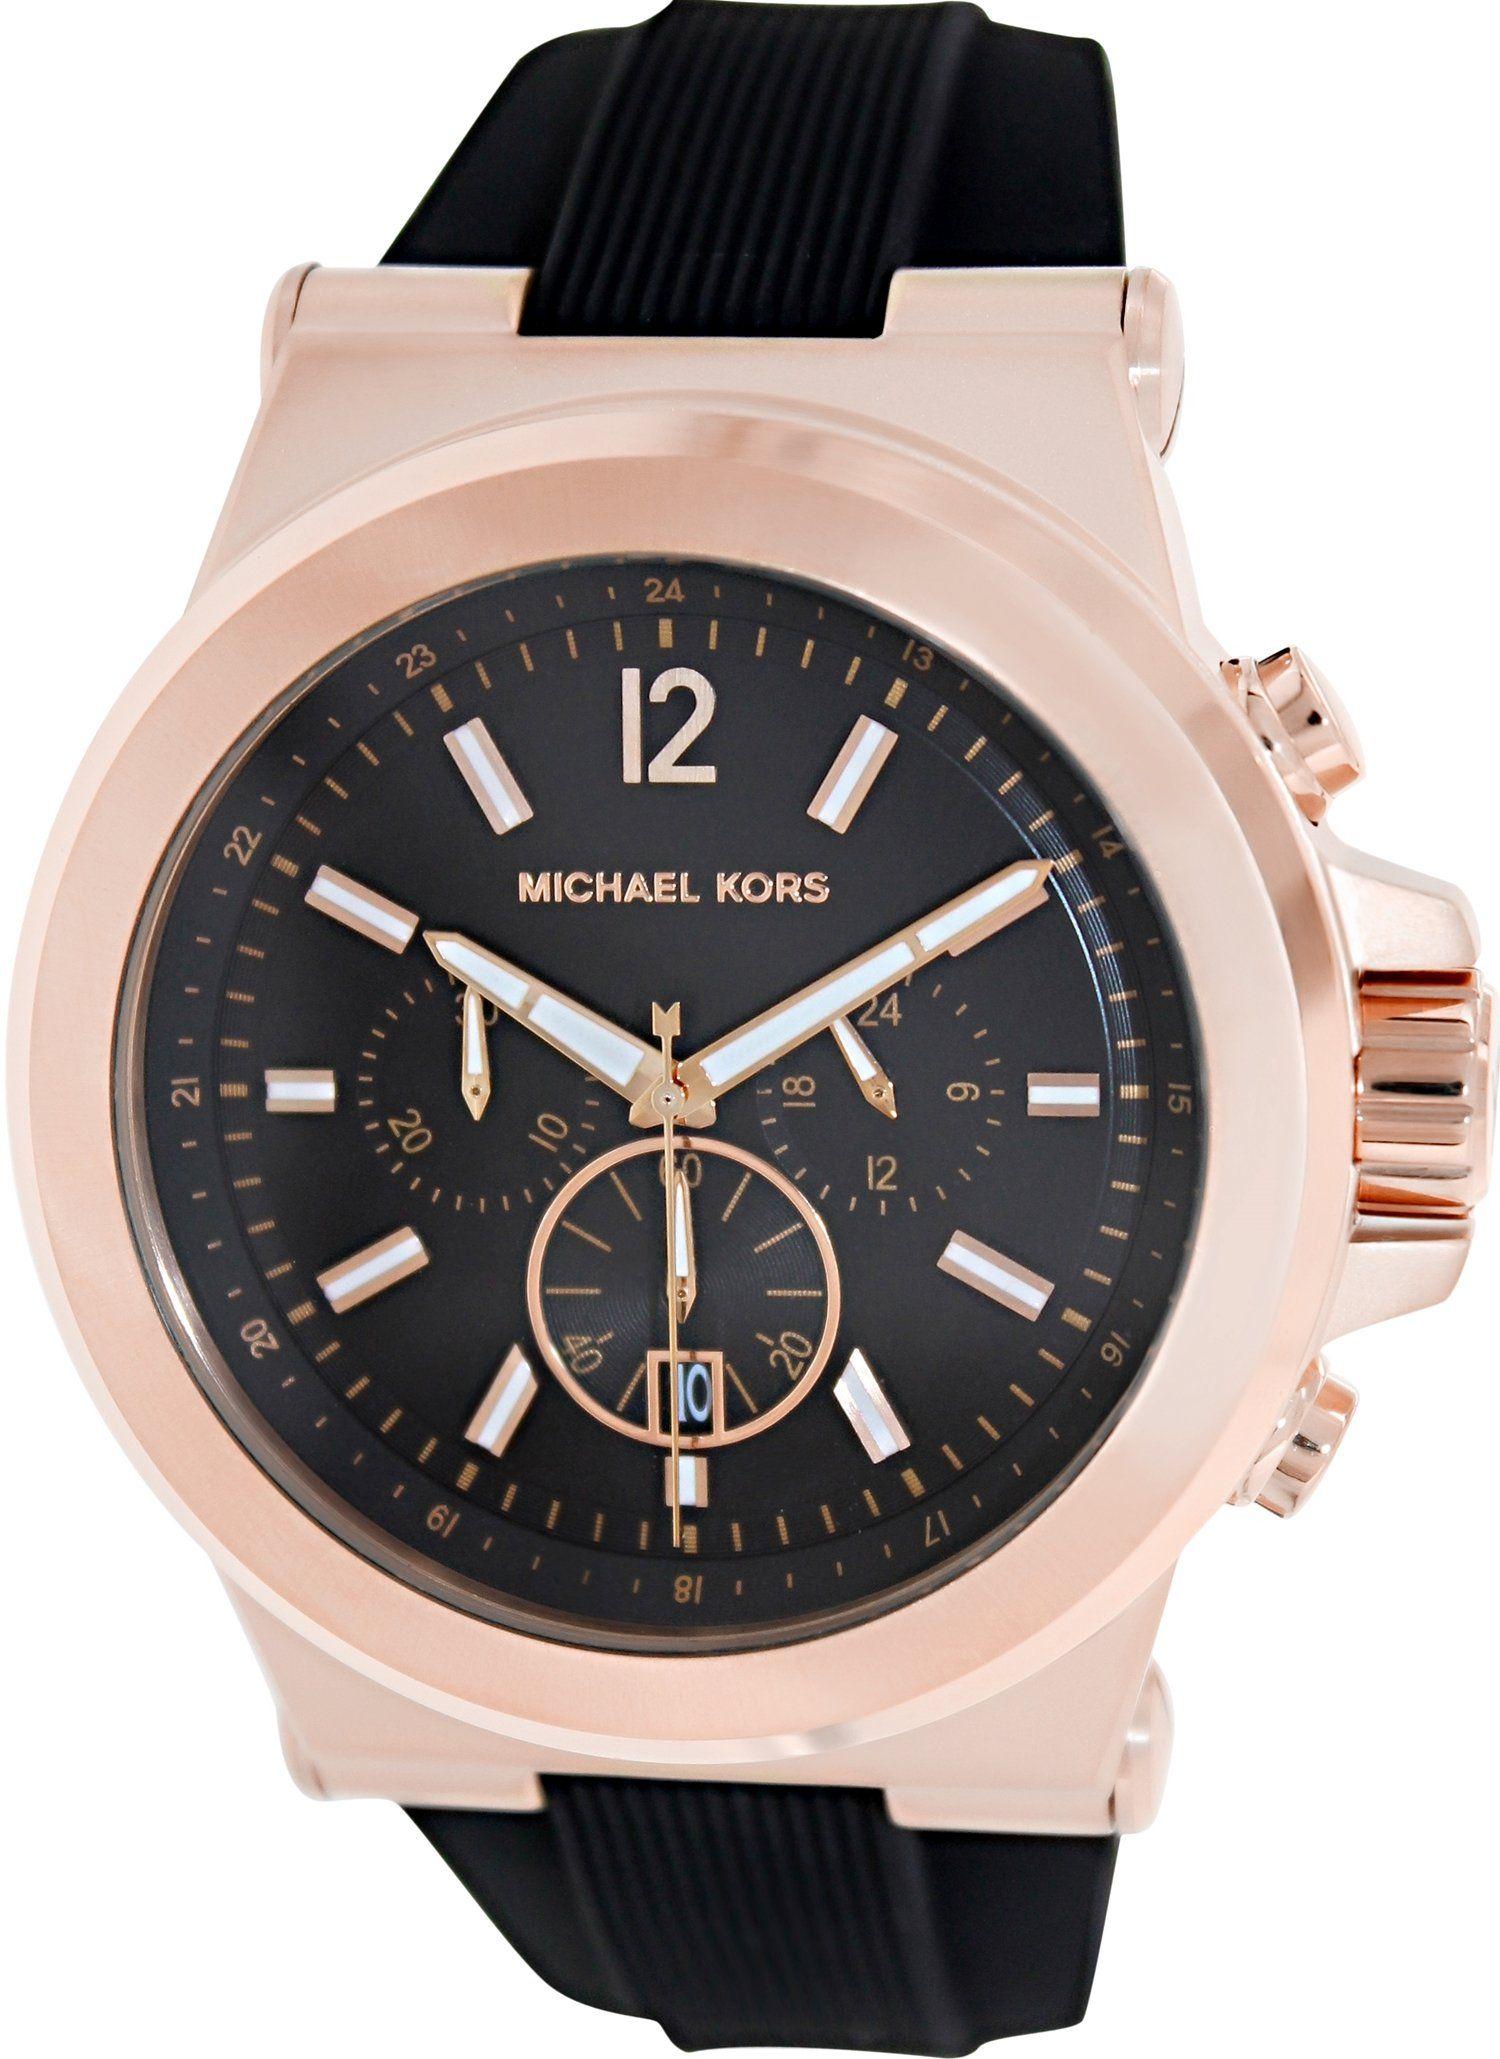 $136.00 - Amazon.com: Michael Kors MK8184 Men's Classic Watch Dial: Black chronograph: Michael Kors: Clothing